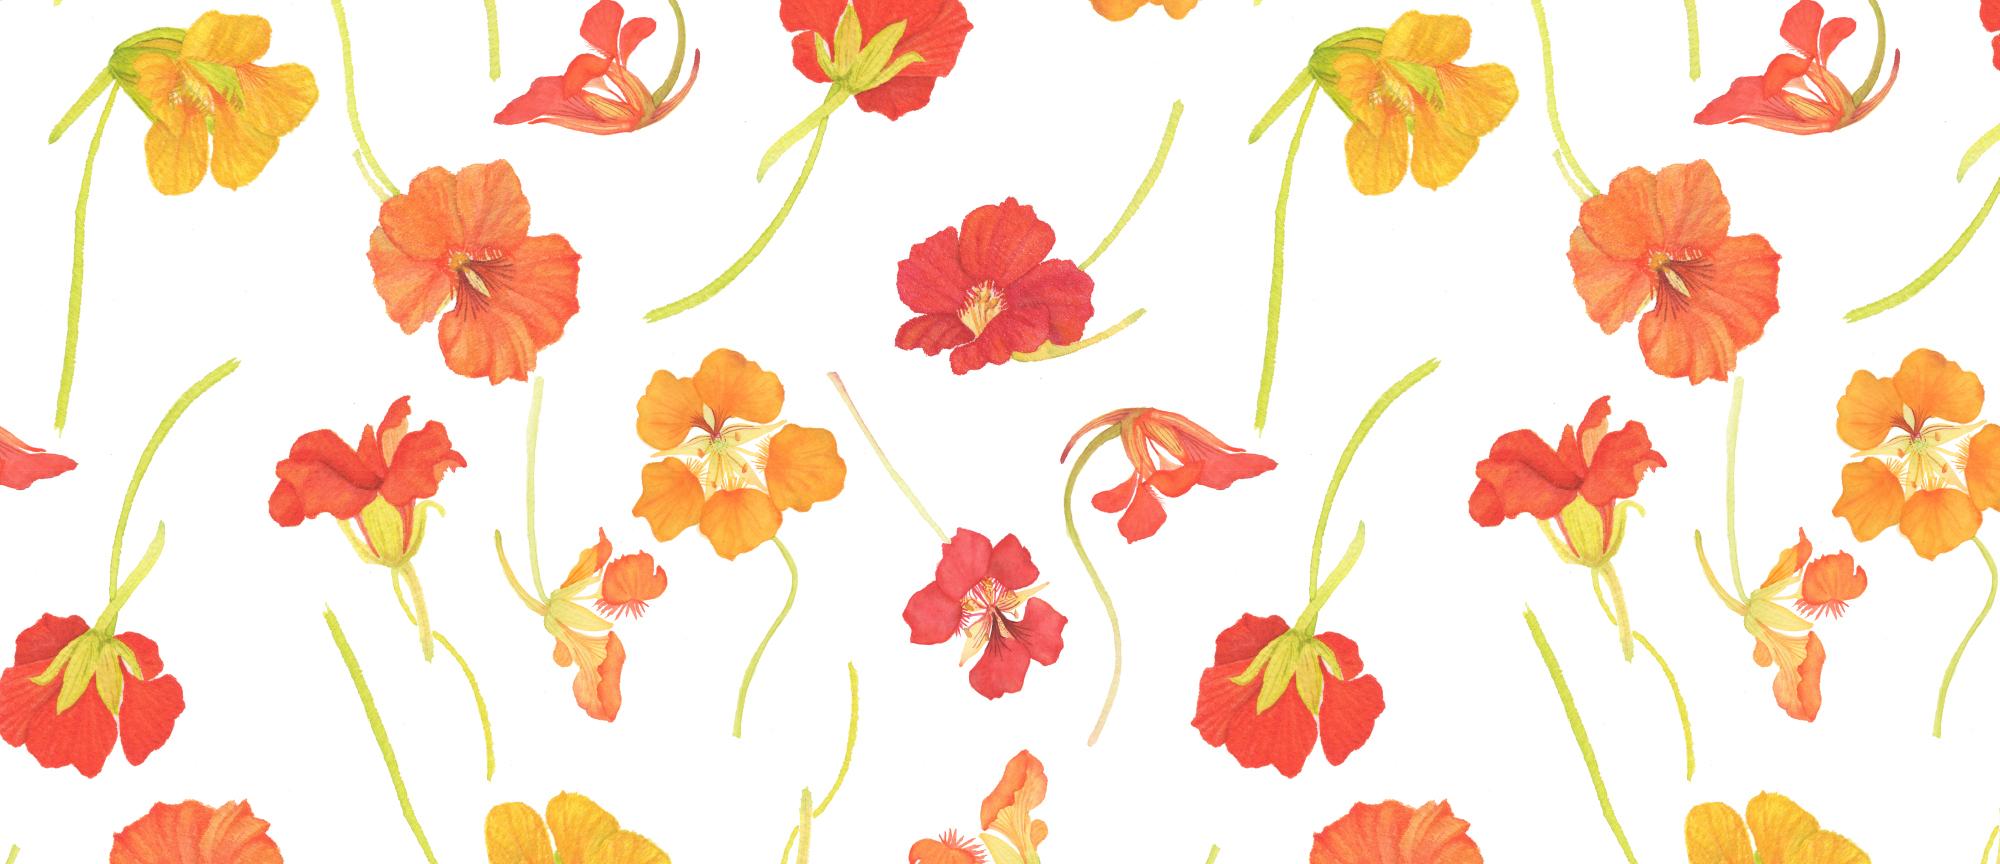 Watercolor Nasturtiums Fabric Design by Anne Butera